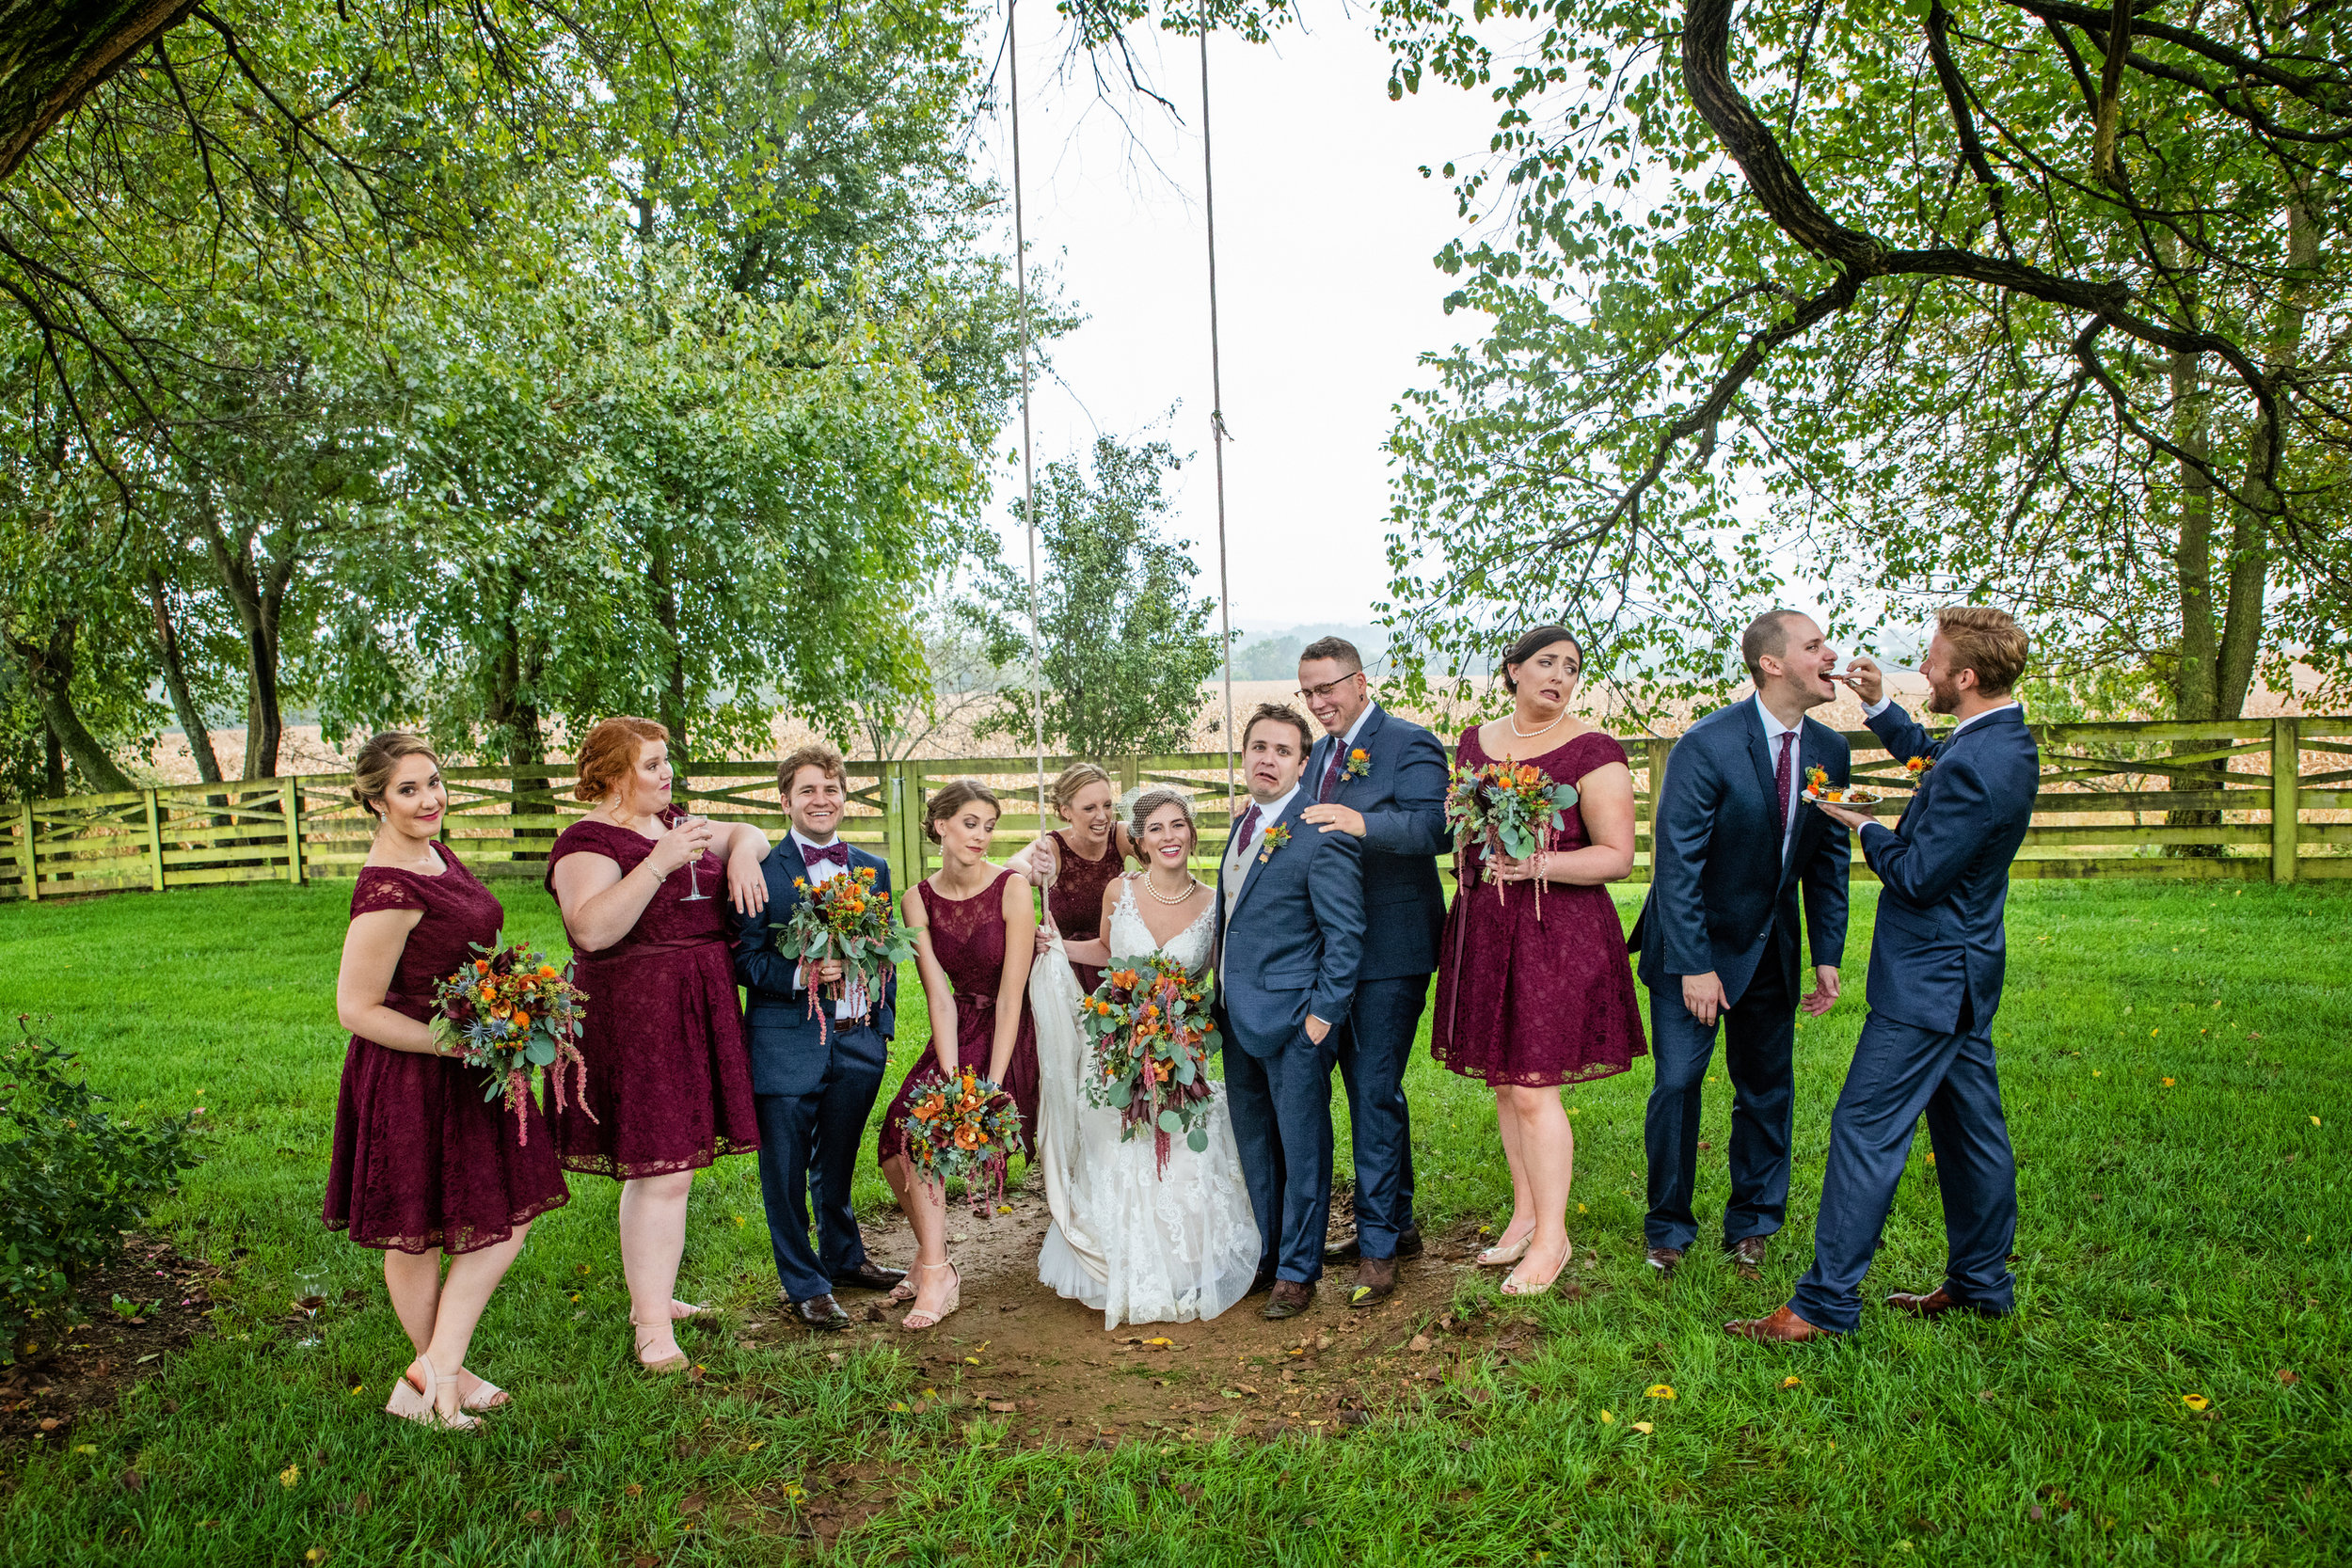 WalkersOverlookWedding-Angela&Ben-WeddingParty-19.jpg